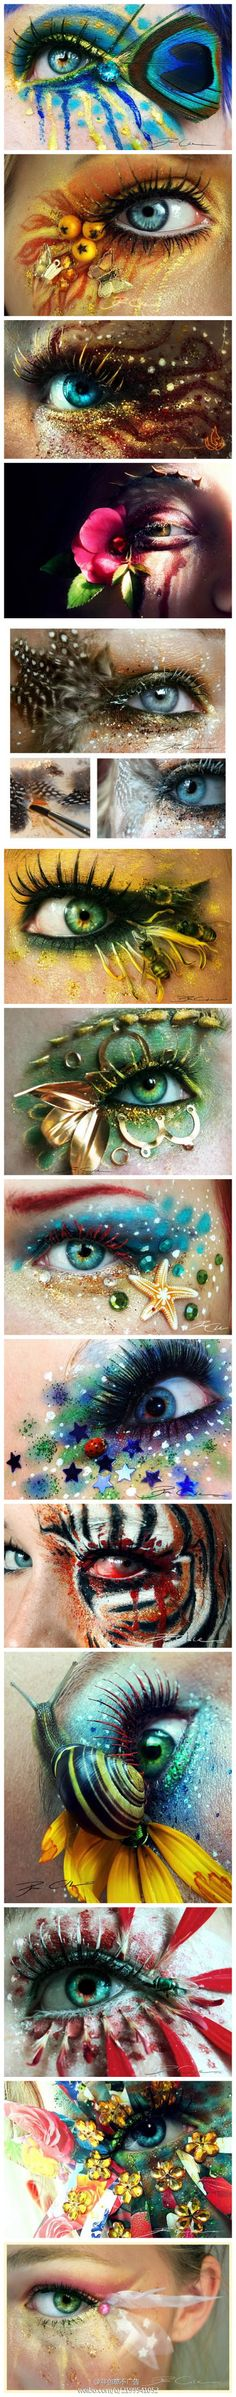 Great creative eye makeup kinda creepy but still cool! Eye Makeup Art, Eye Art, Beauty Makeup, Fantasy Make Up, Behind Blue Eyes, Special Effects Makeup, Crazy Makeup, Costume Makeup, Creative Makeup